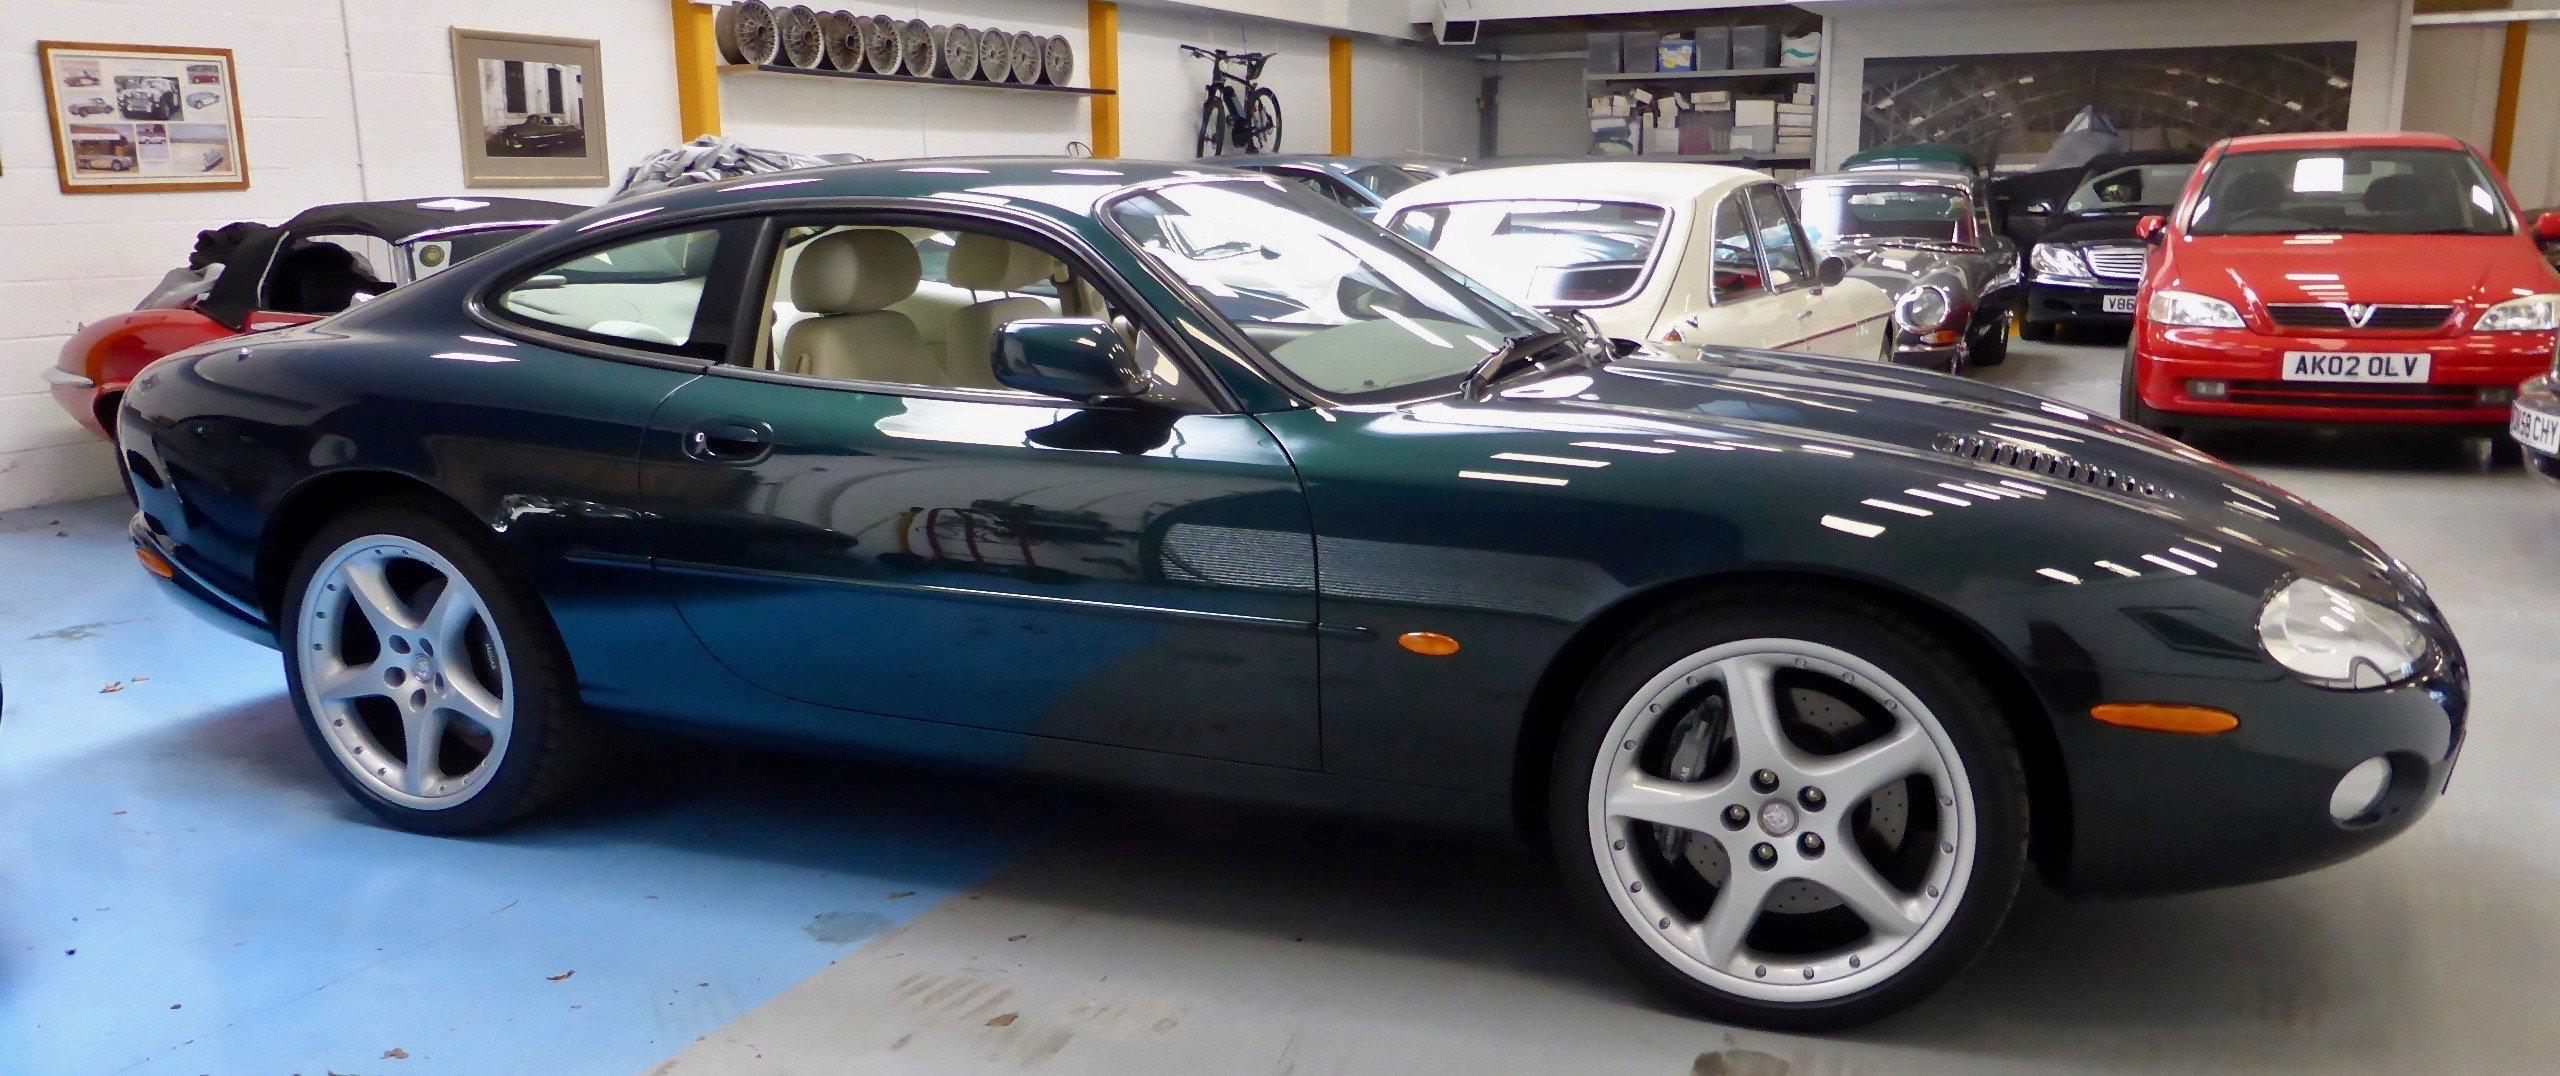 2001 Jaguar XKR 2dr Auto Sports Coupe For Sale (picture 2 of 5)